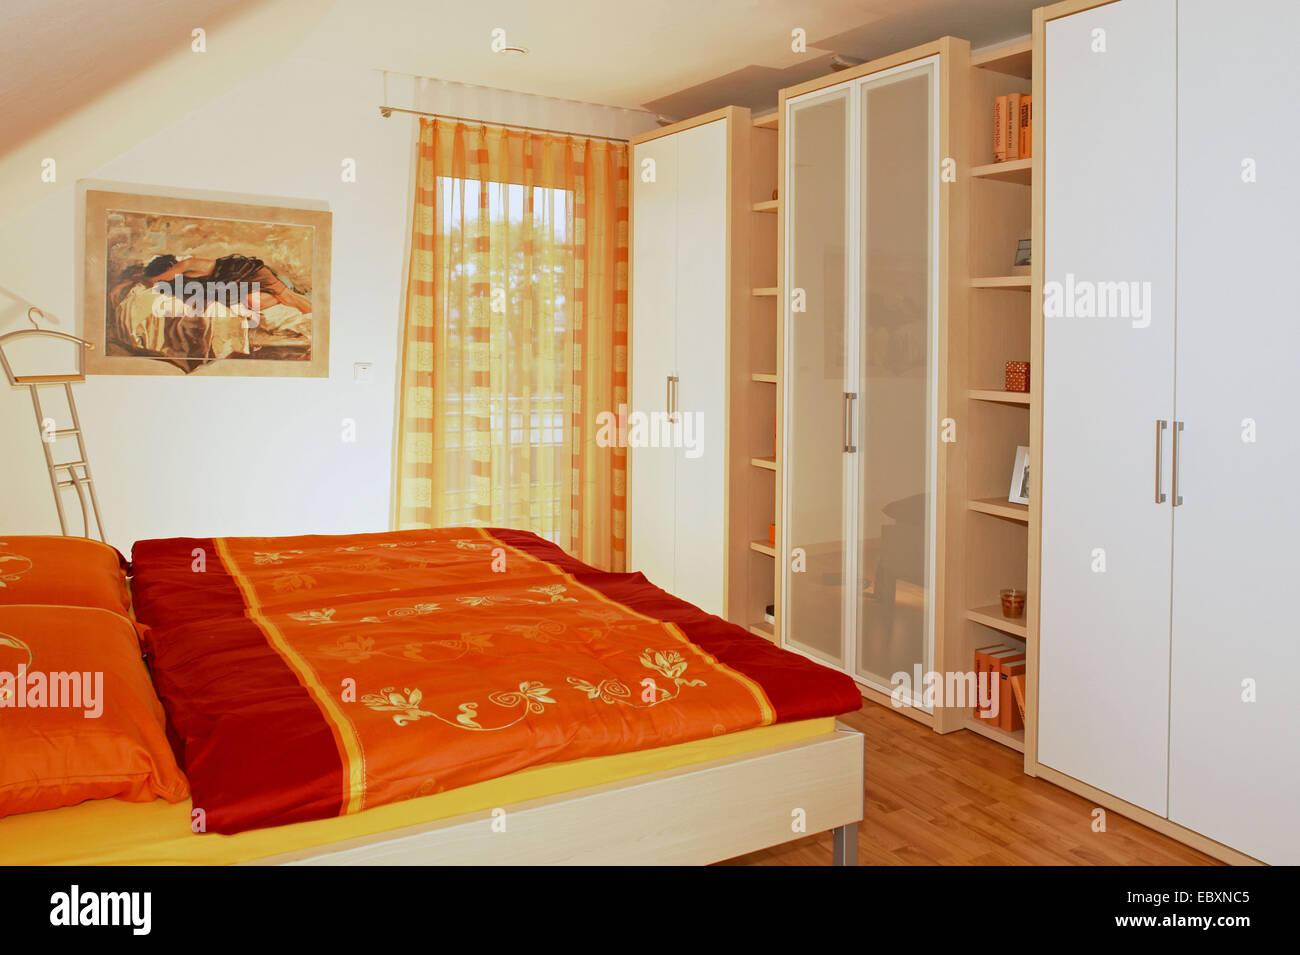 single family house inside, sleeping room Stock Photo: 76190245 - Alamy